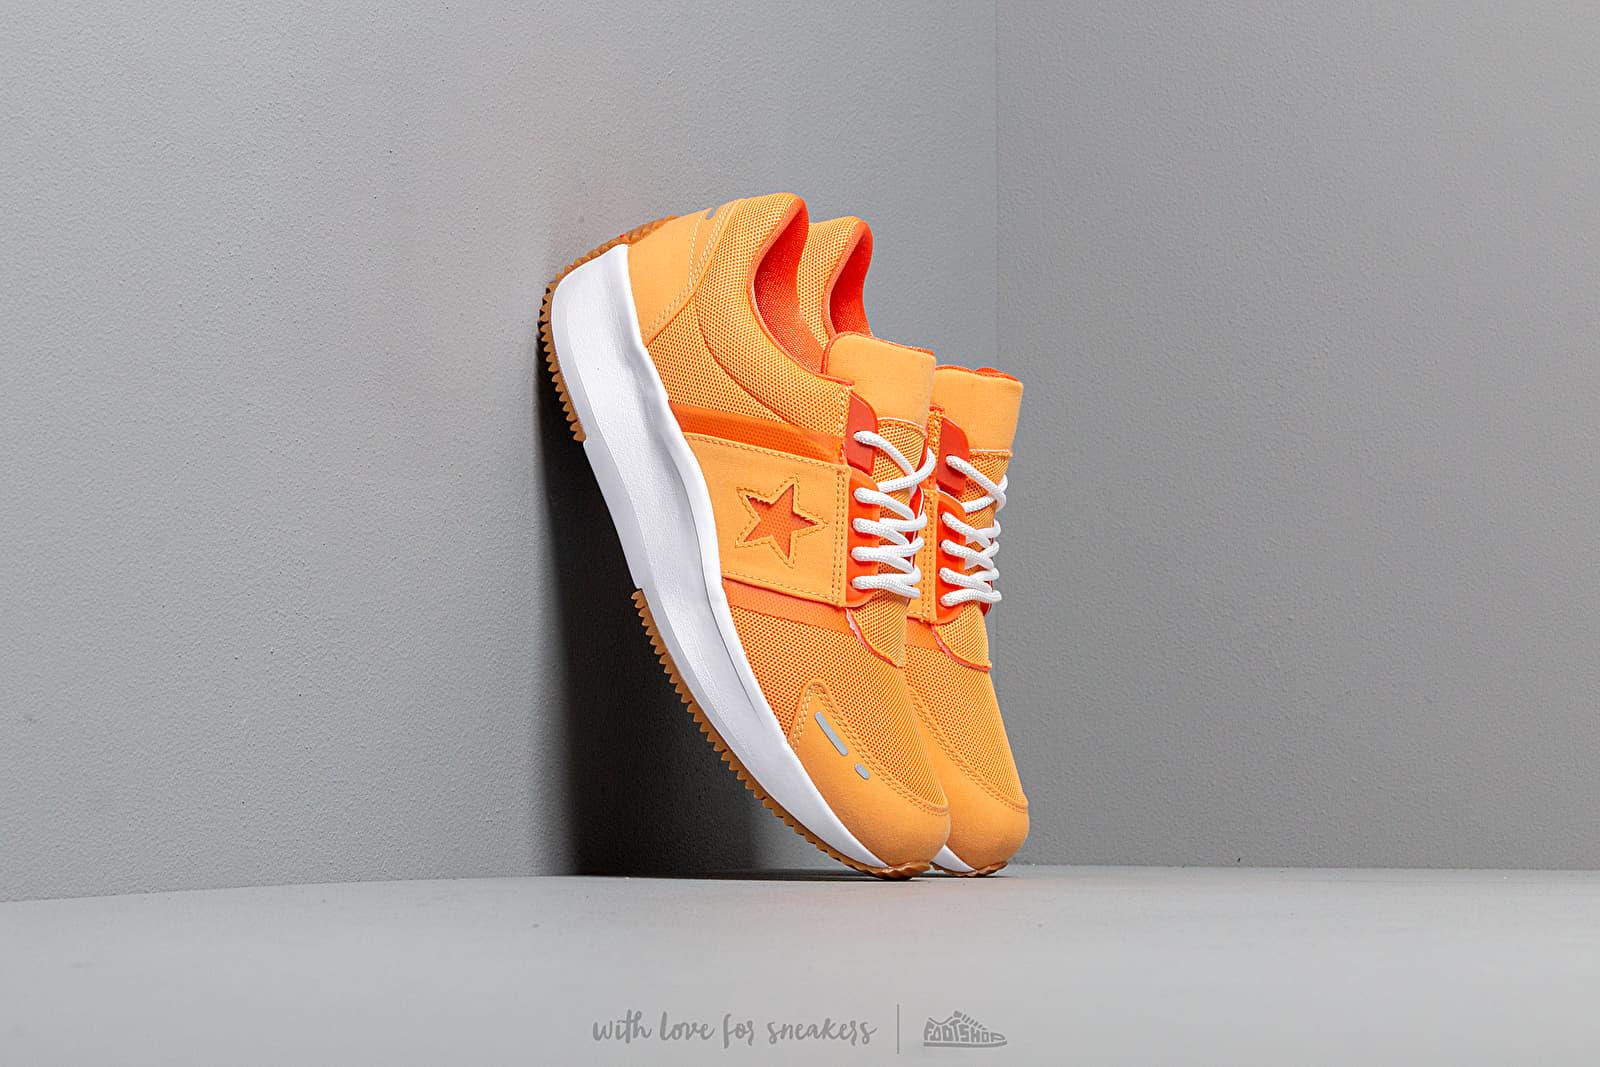 Men's shoes Converse Run Star Melon Baller/ Turf Orange/ White